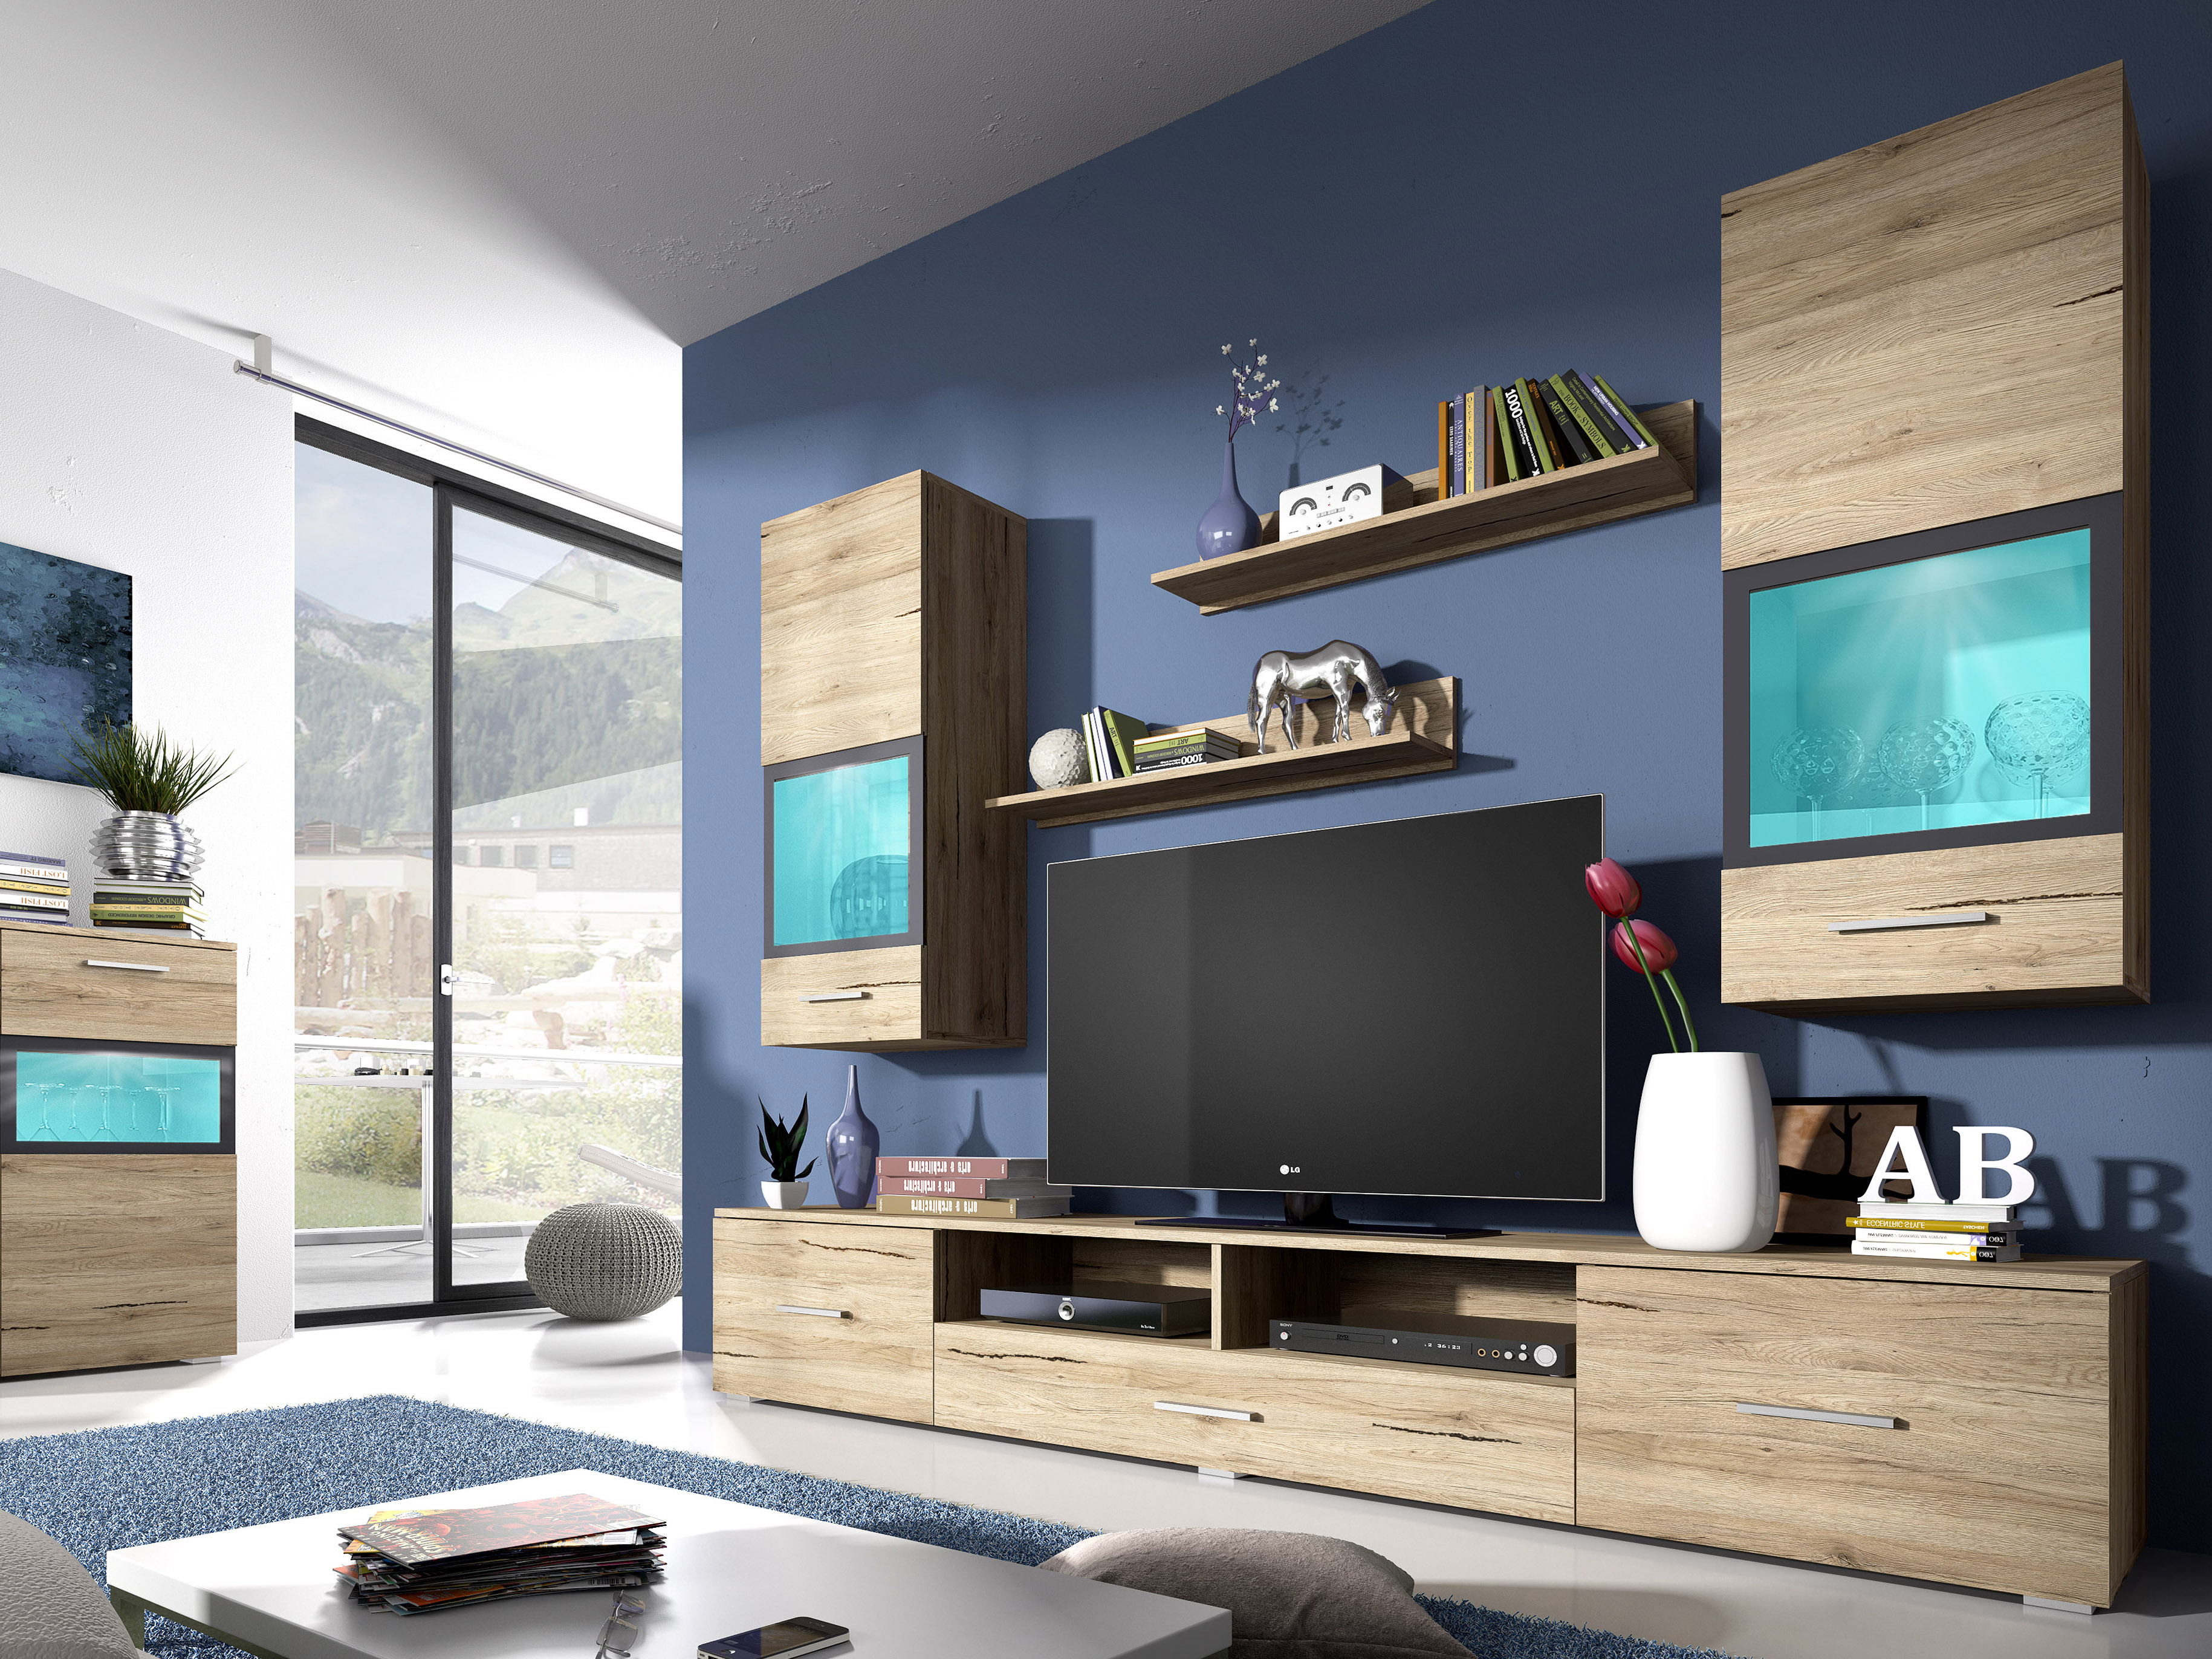 Obývací stěna - Sapphire - Typ 09 (dub san remo)